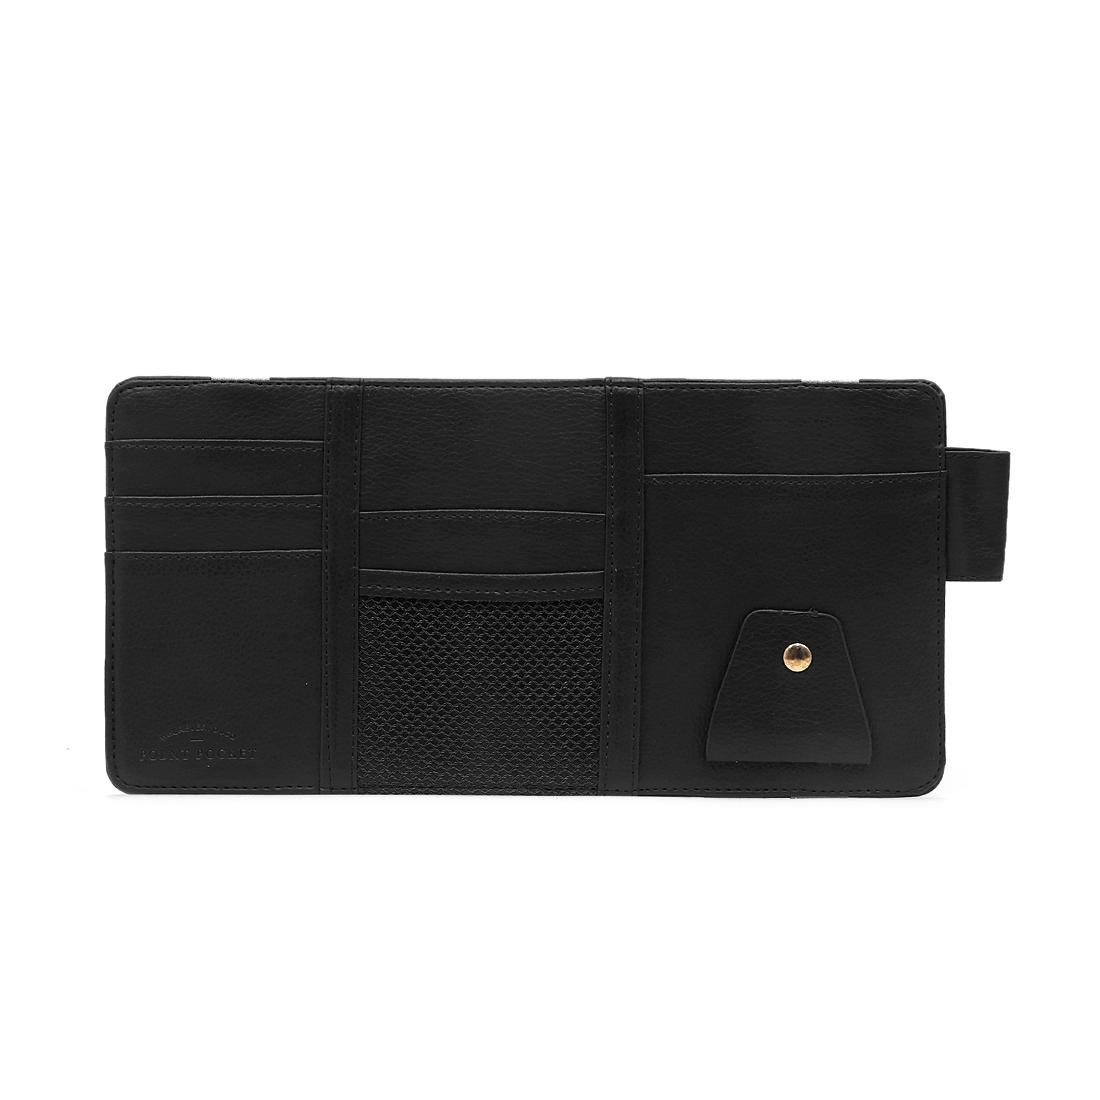 Black Faux Leather Car Sun Visor Card Holder Multi-purpose Storage Bag Organizer